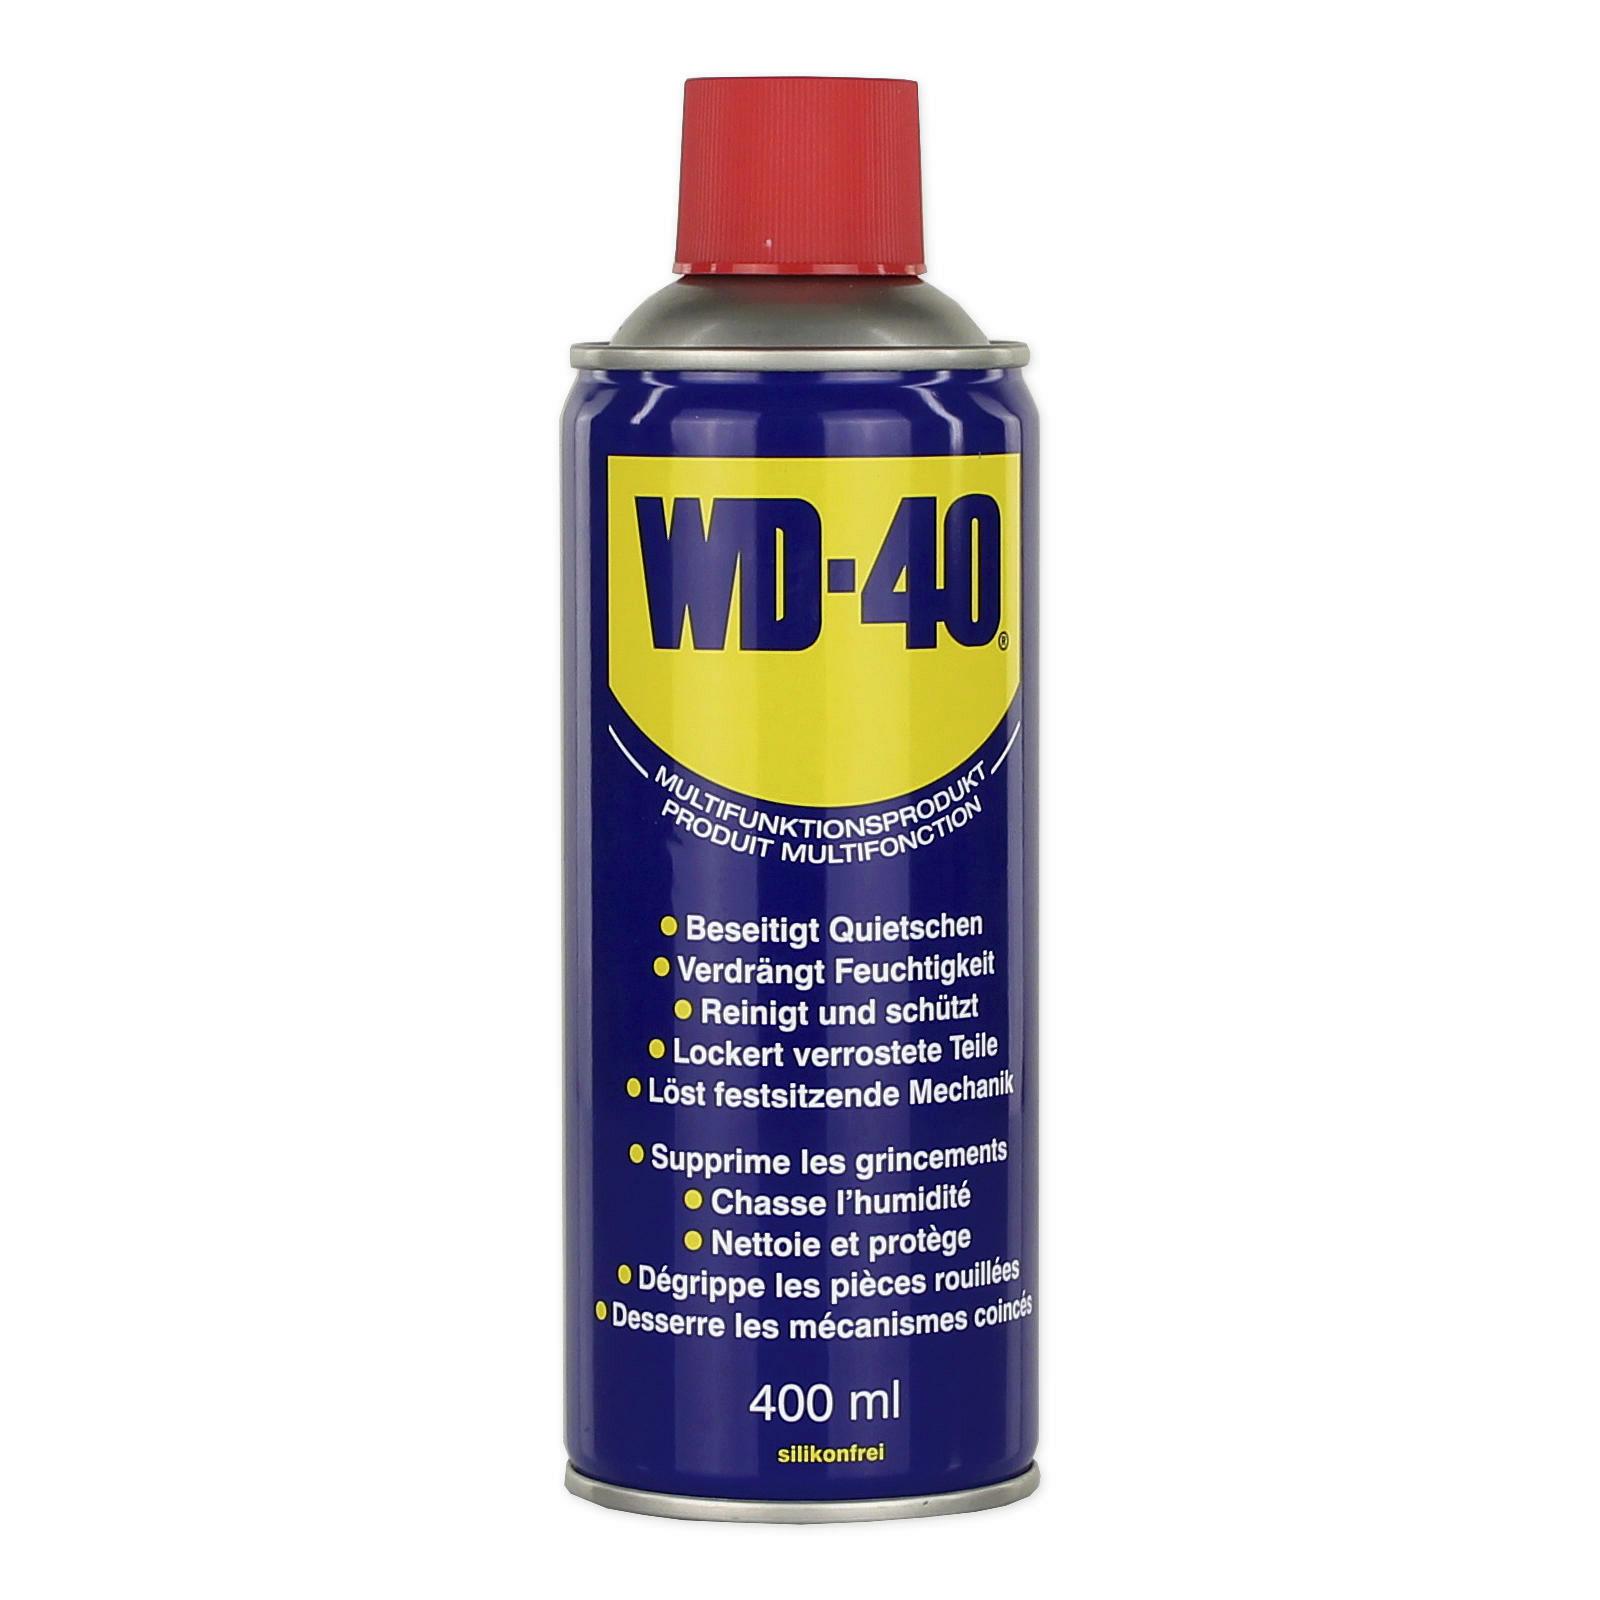 WD-40 Vielzweckspray 400ml